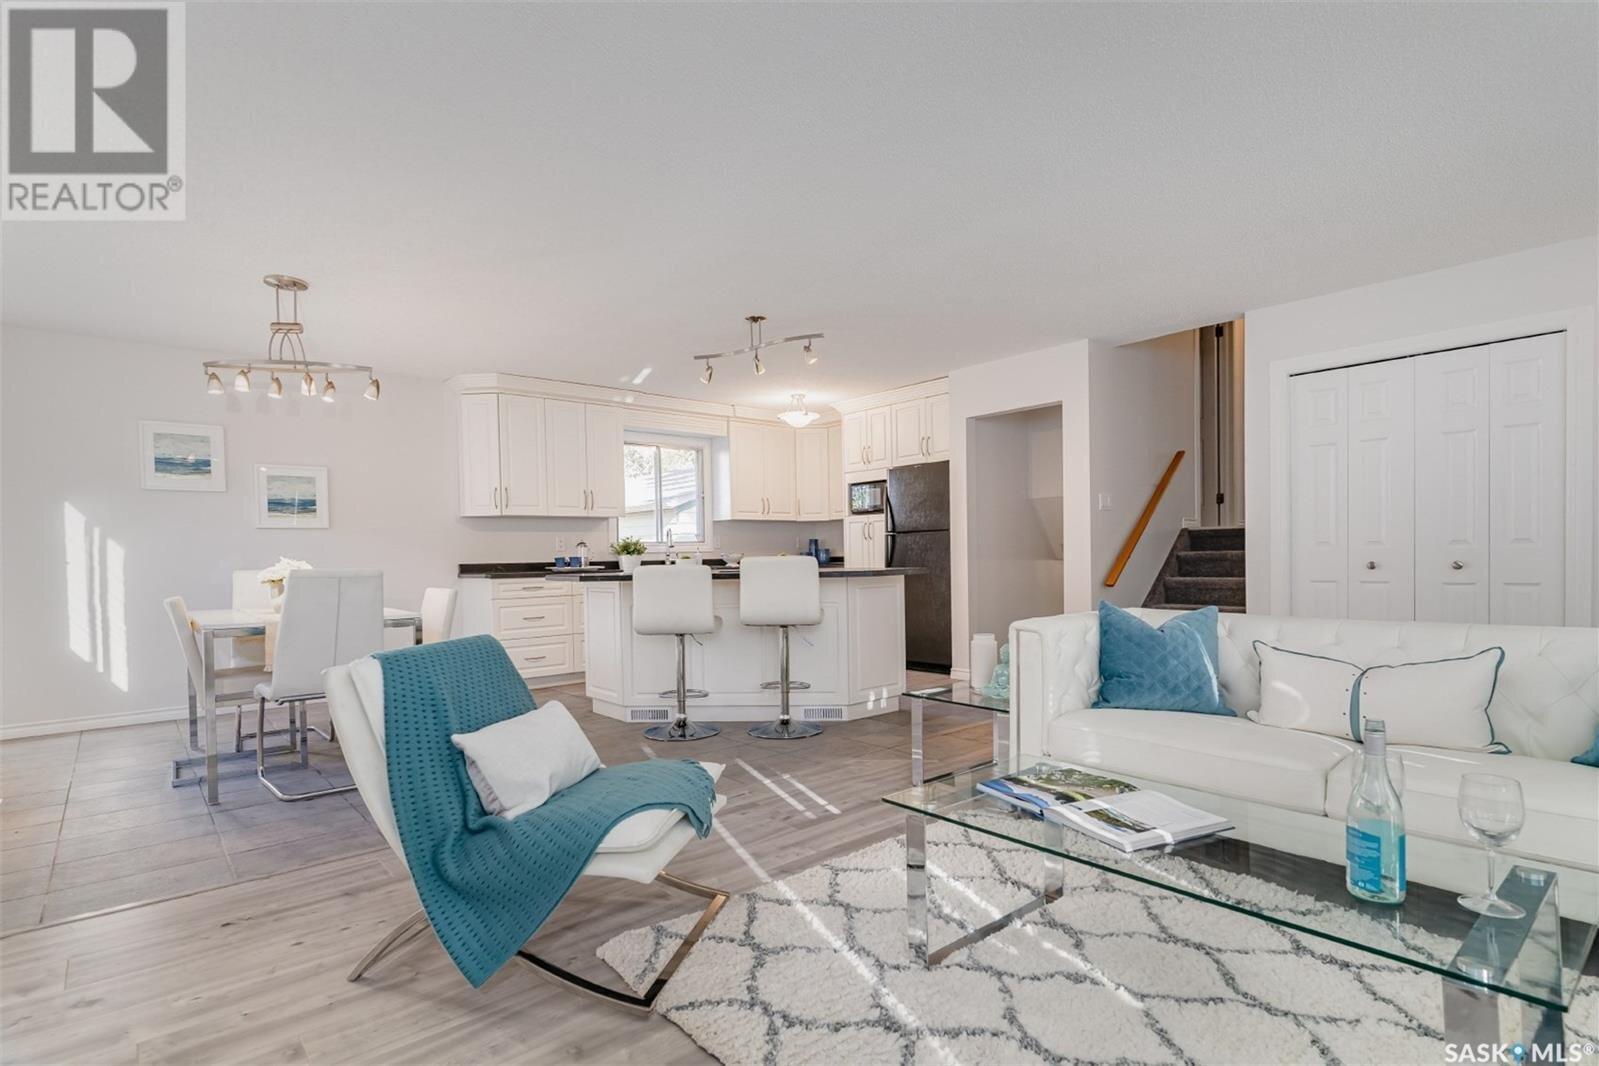 House for sale at 3727 Taylor St E Saskatoon Saskatchewan - MLS: SK833538